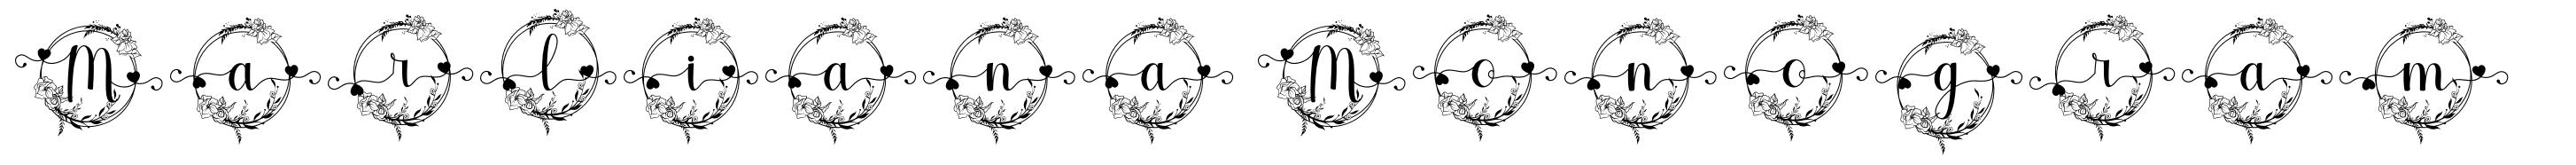 Marliana Monogram